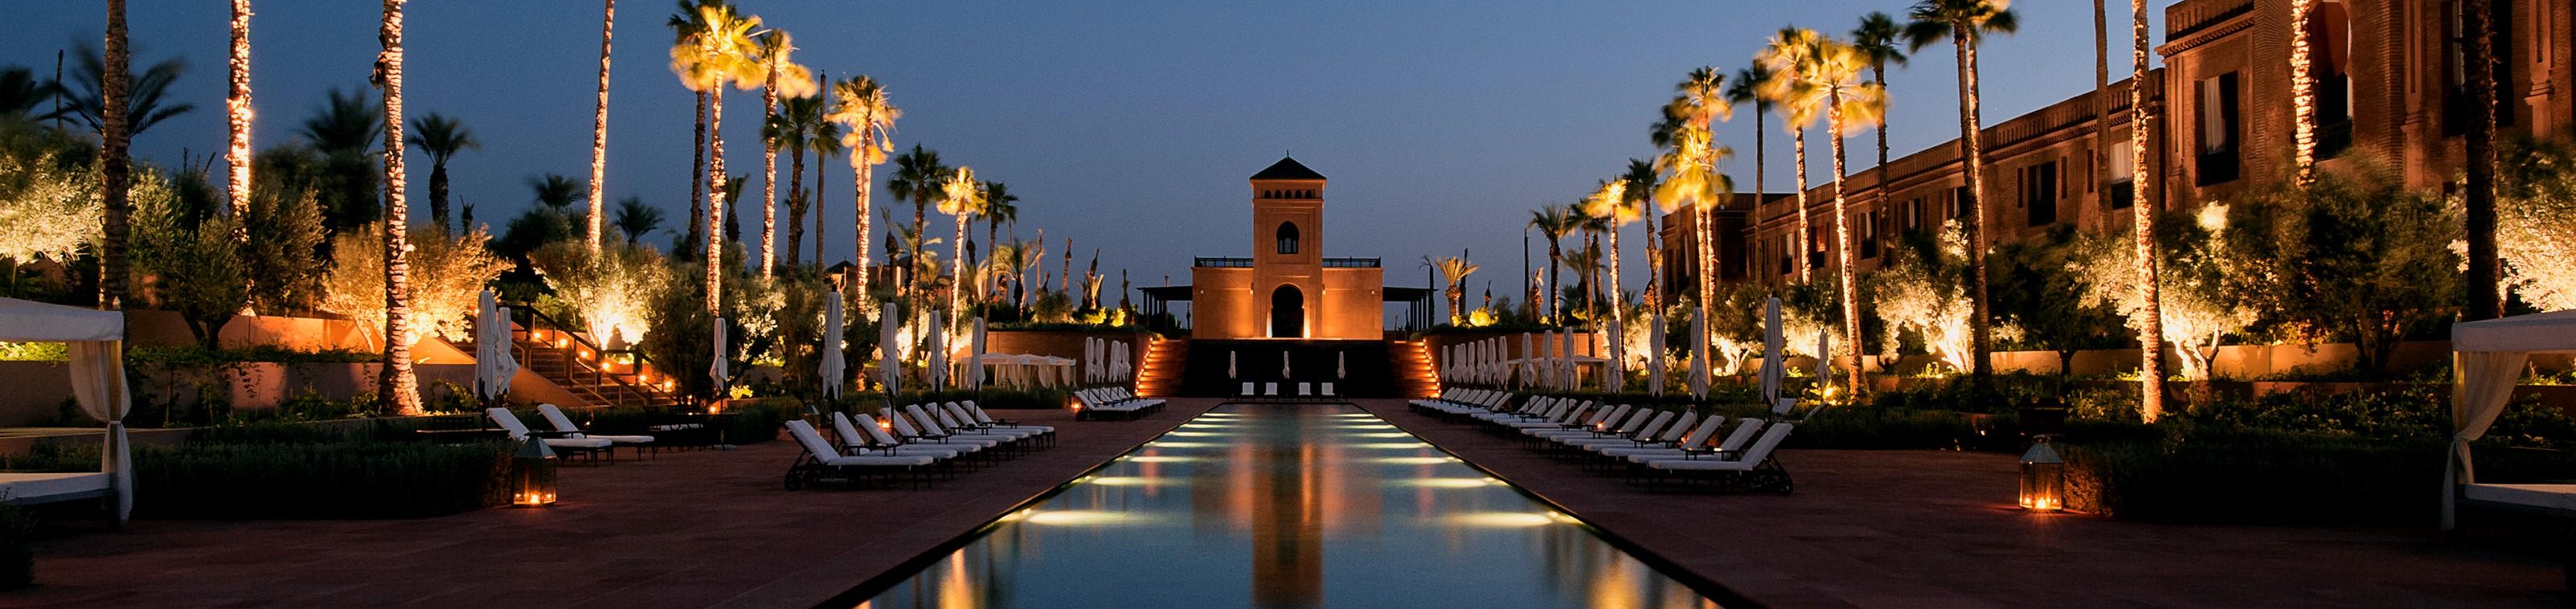 Citytrip luxueux Marrakech